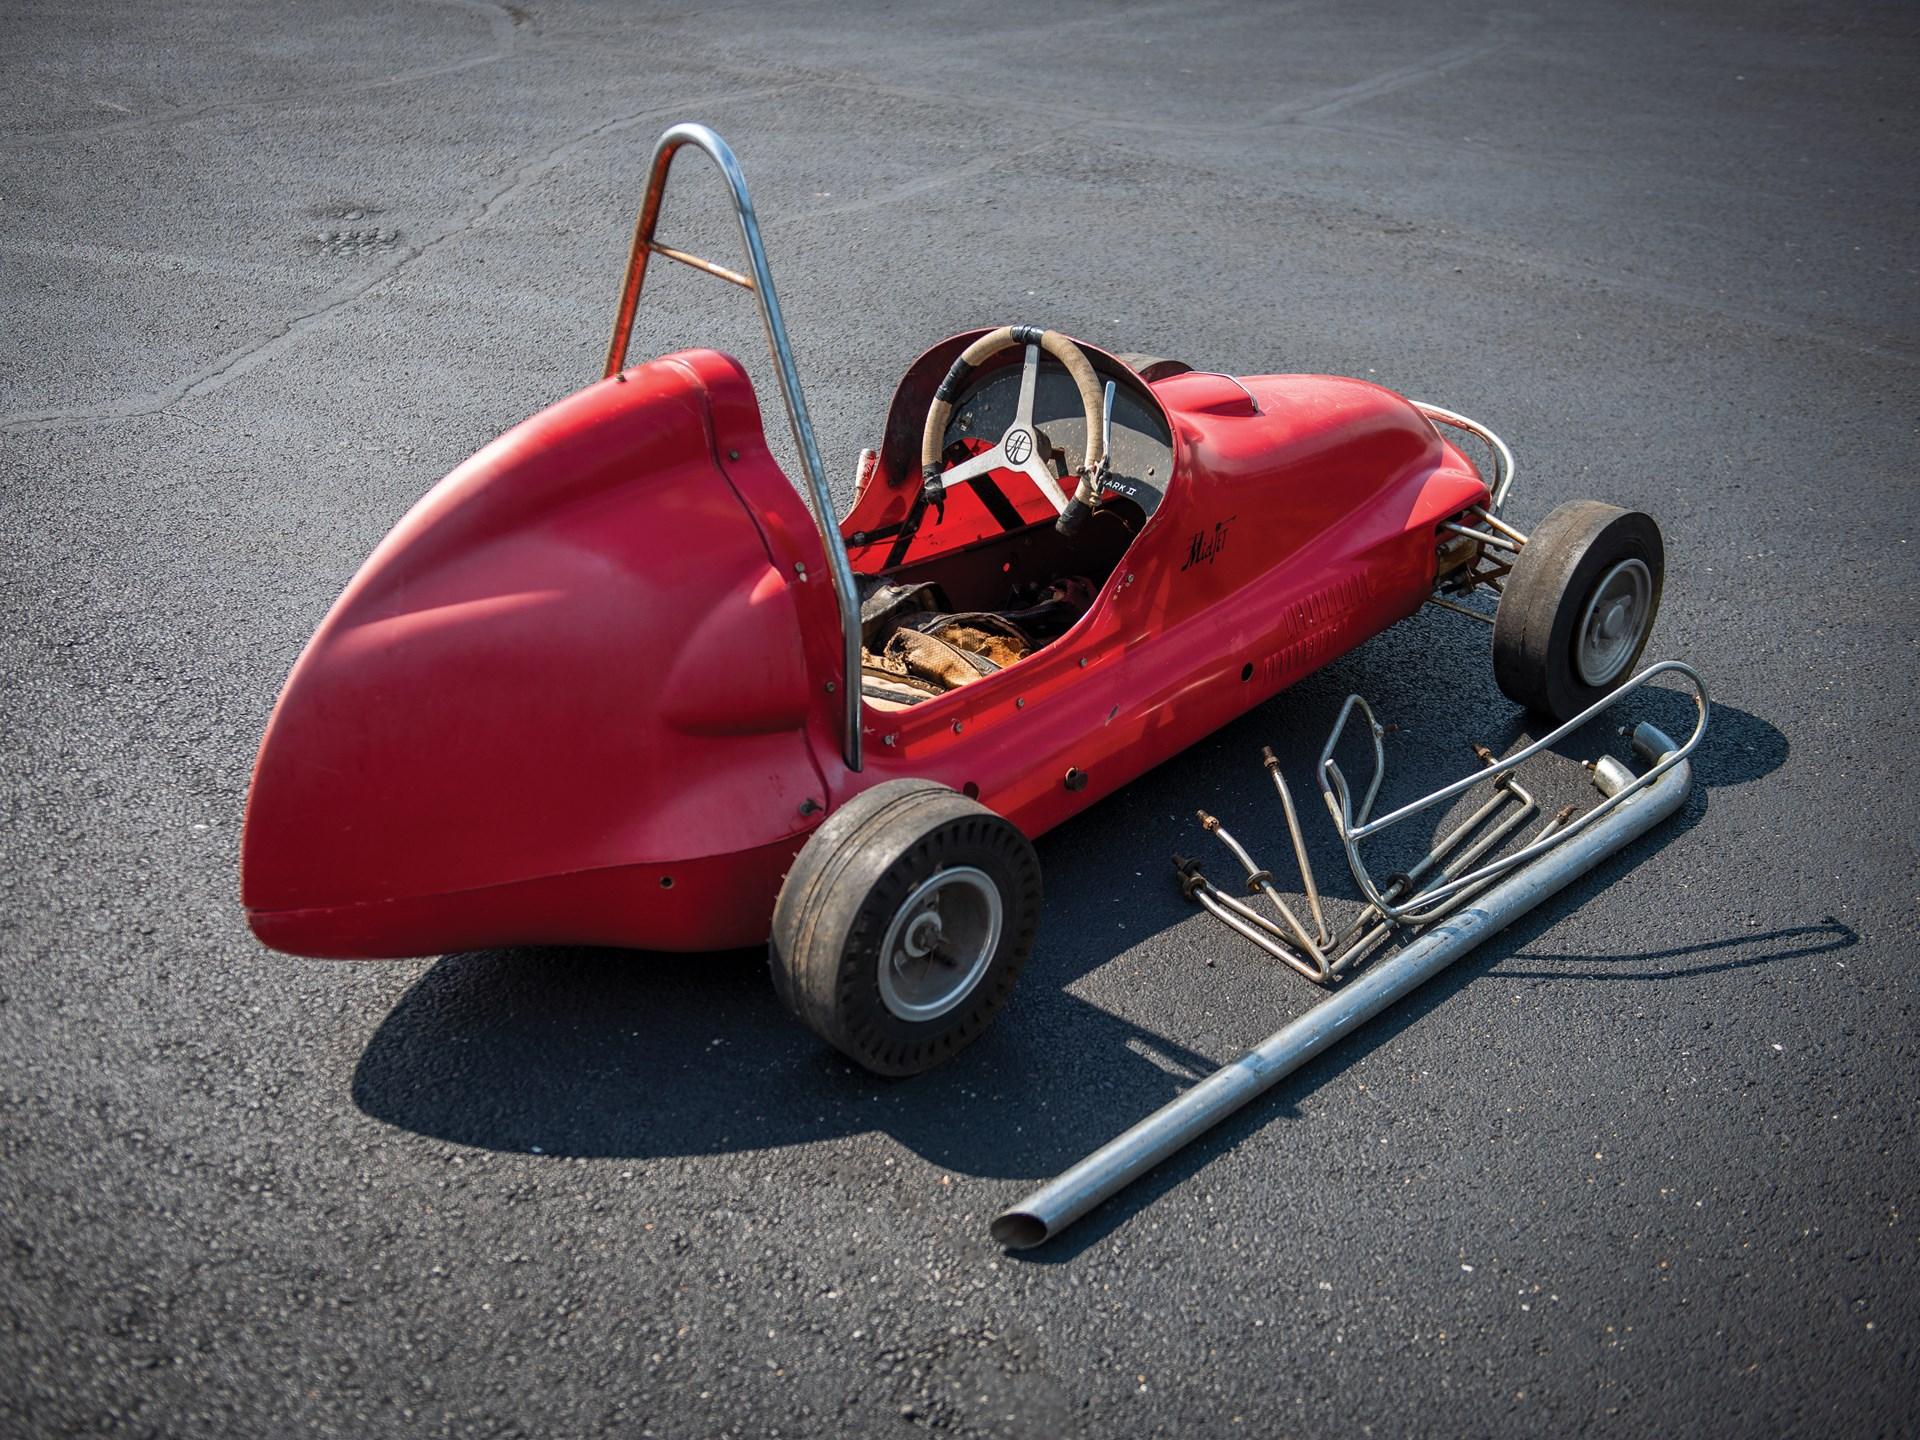 Miami midget race cars and equipment, mini clit vibrators